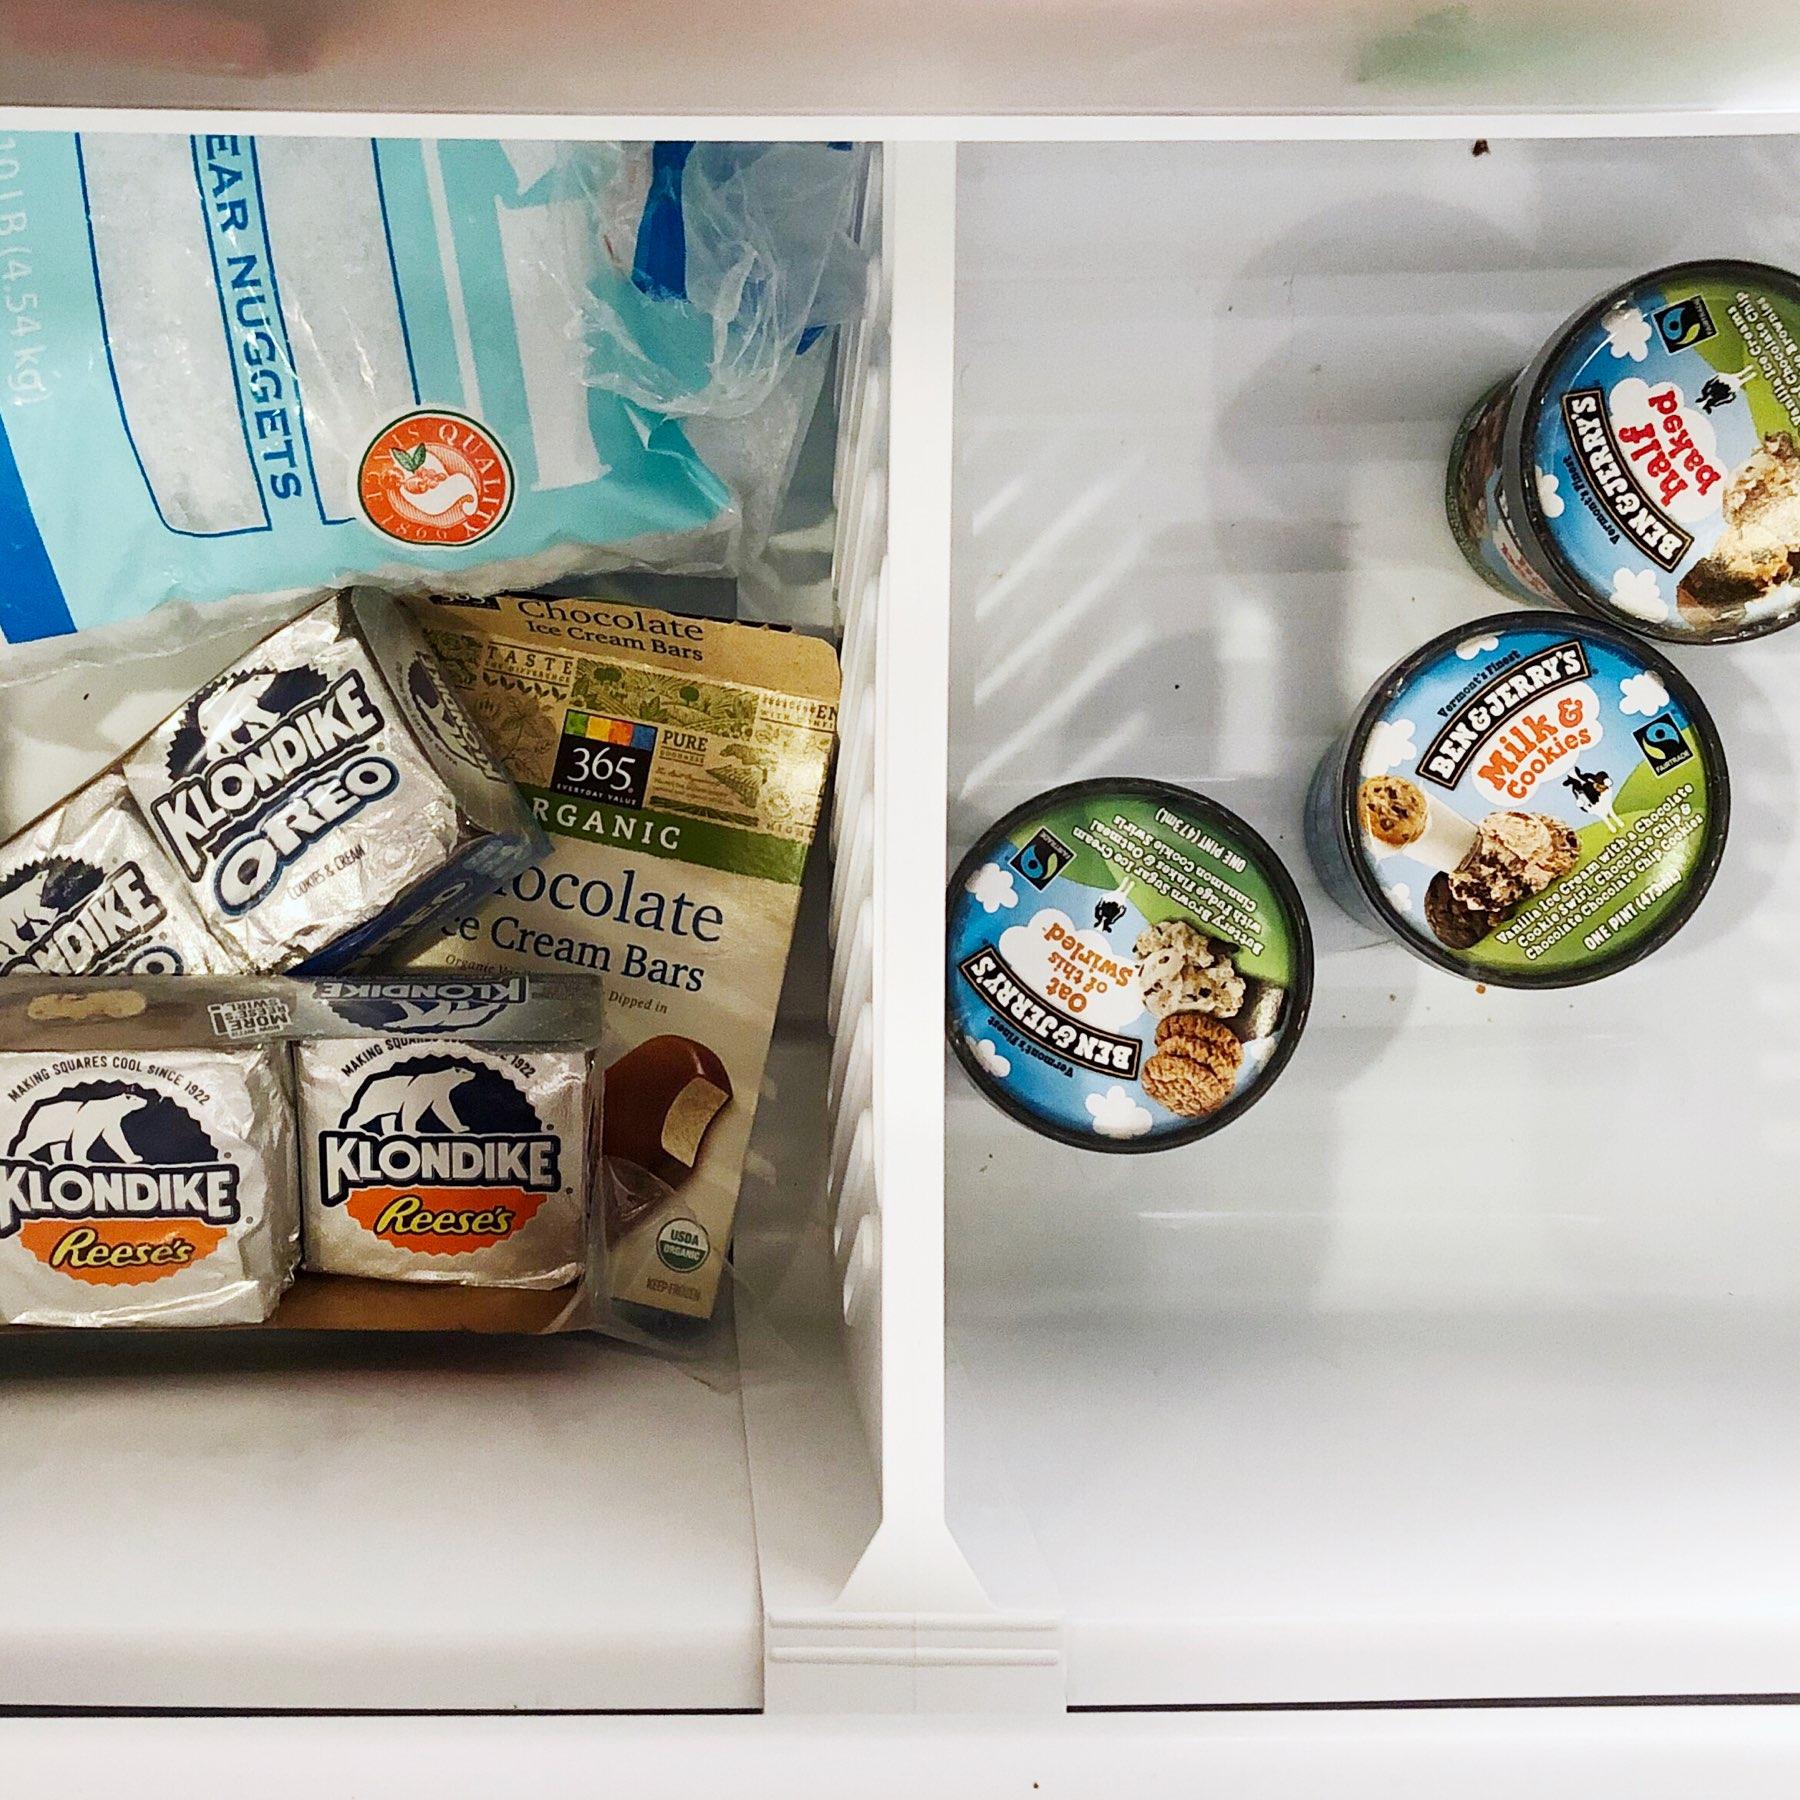 A freezer full of treats.